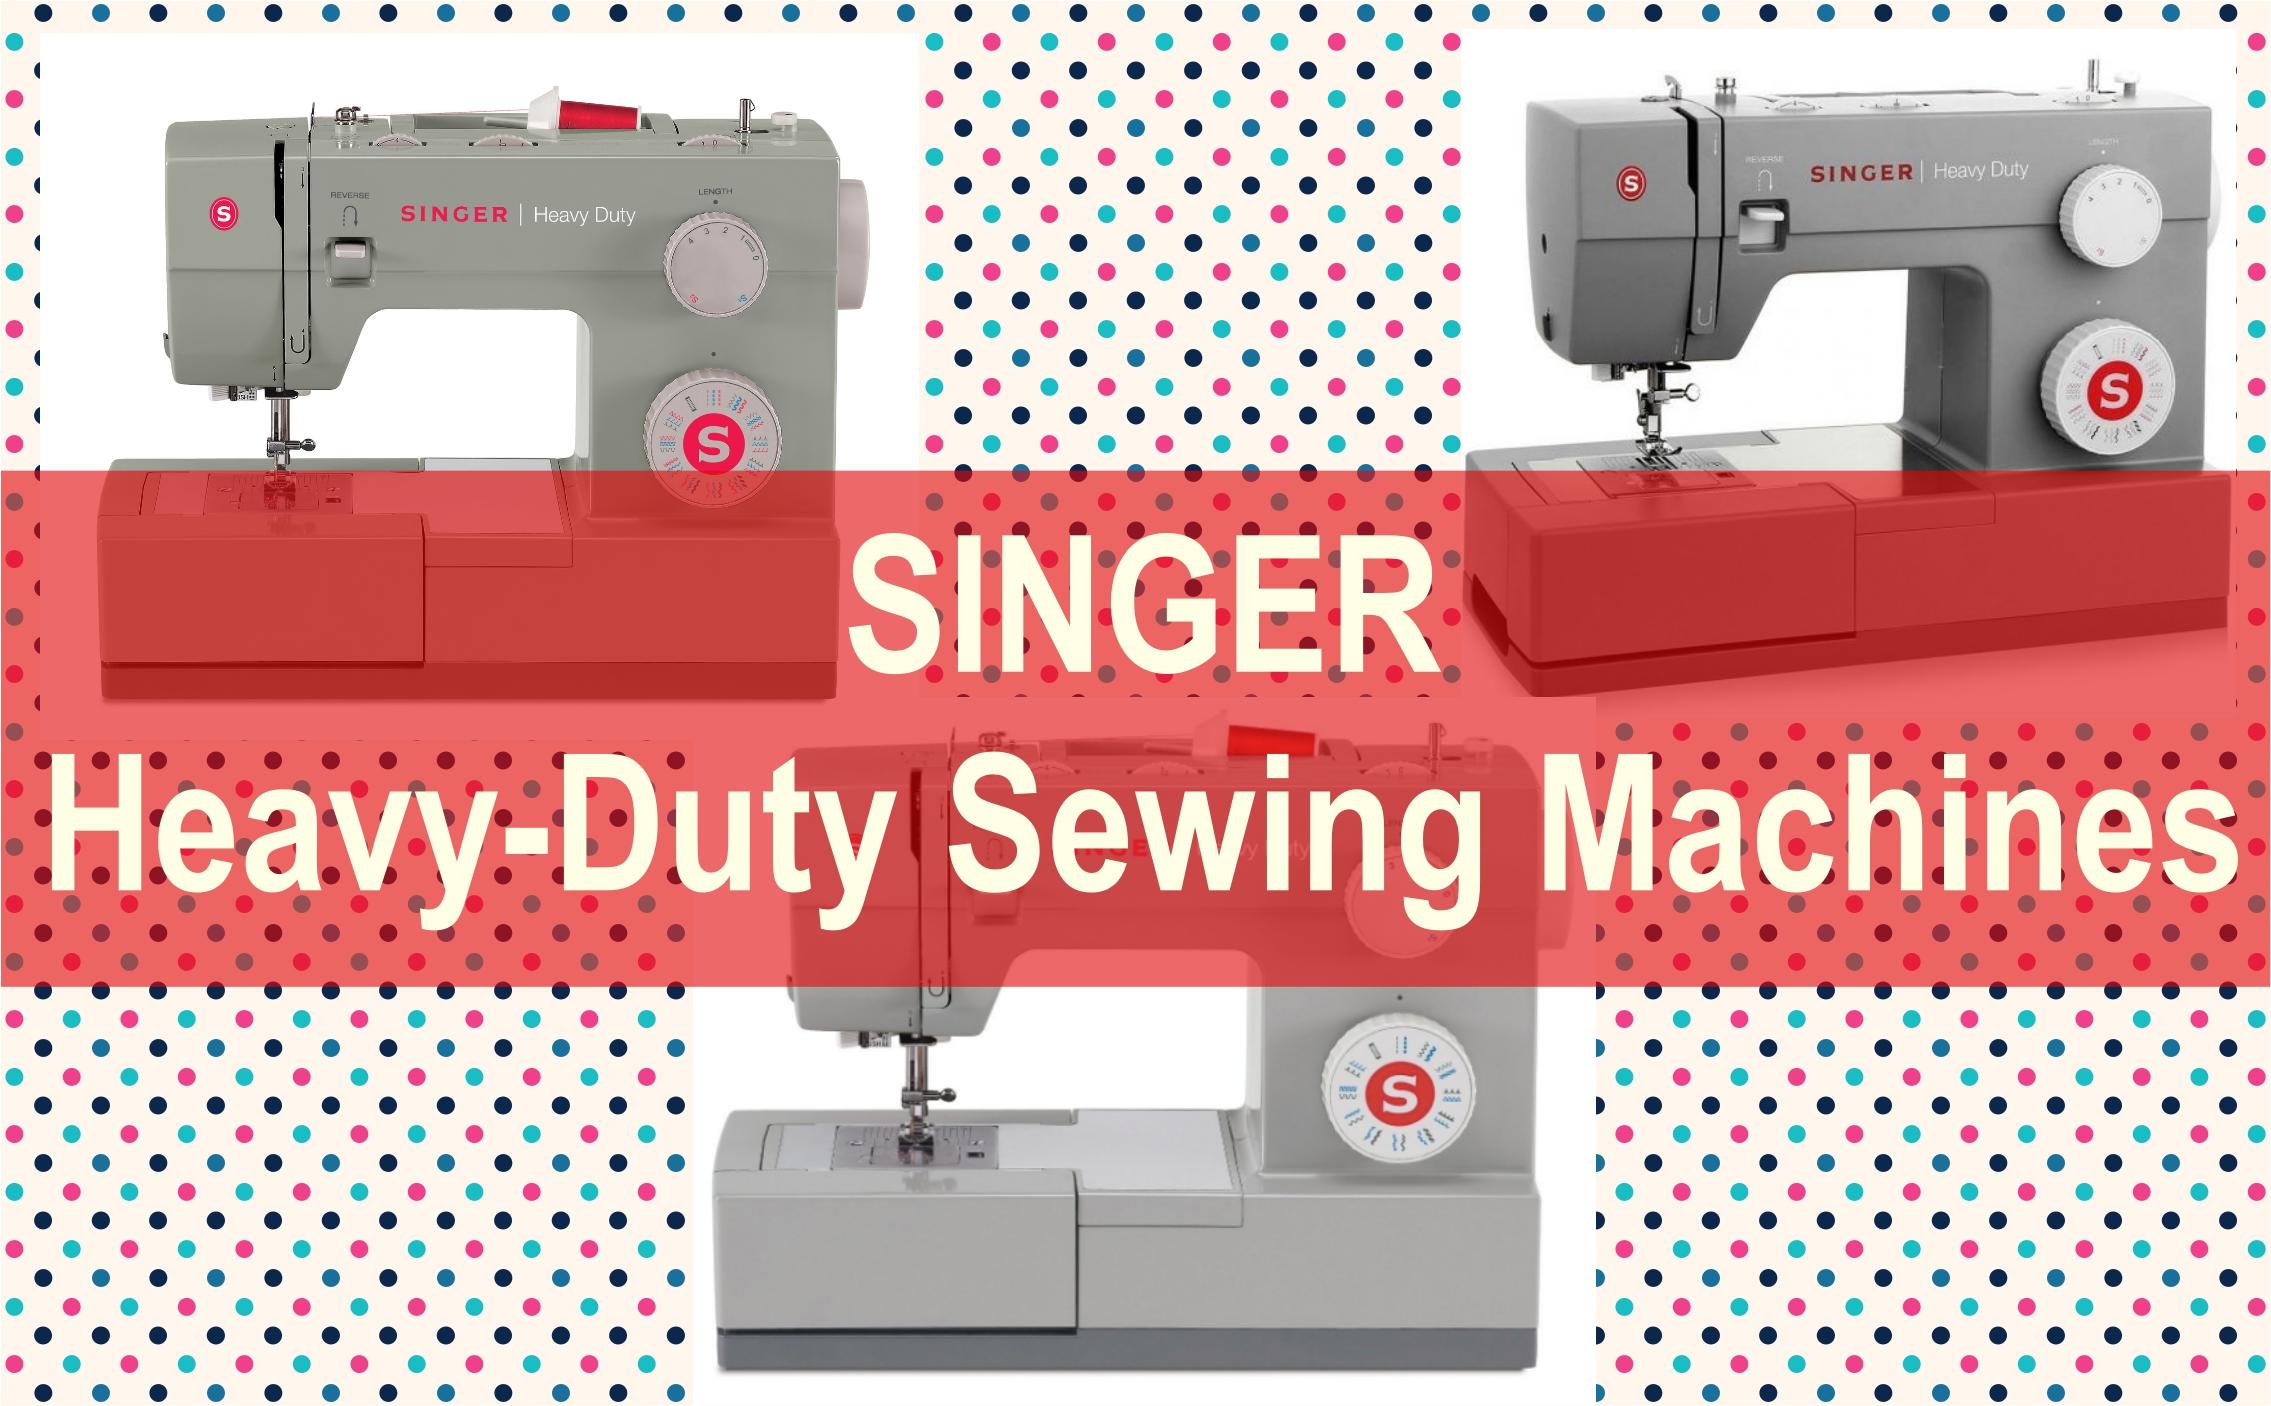 Top 3 SINGER Heavy-Duty Sewing Machines Reviews   Best ...